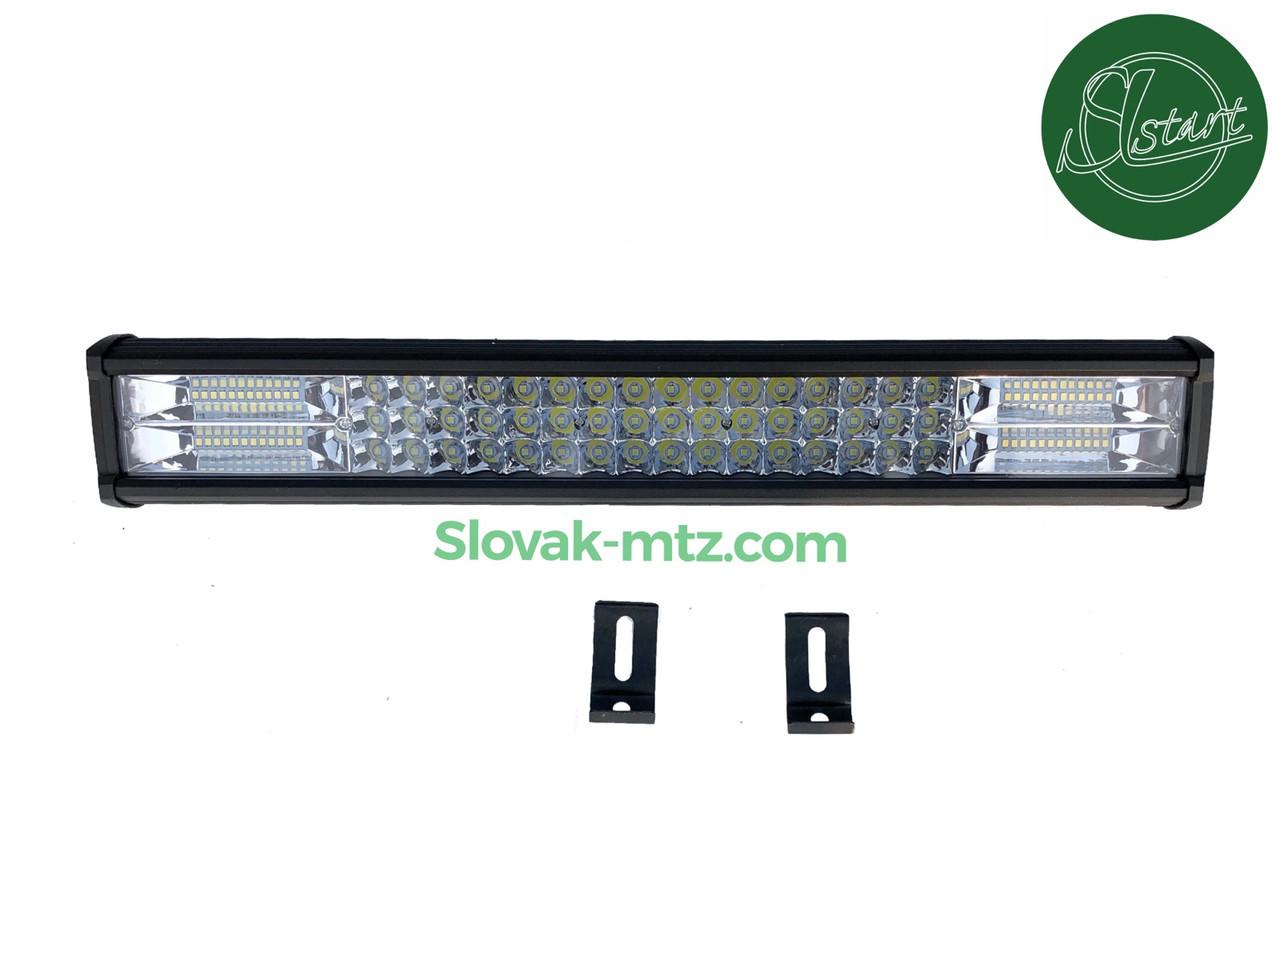 Светодиодная LED Балка (50см) 288Вт  (светодиоды 3w x90шт)